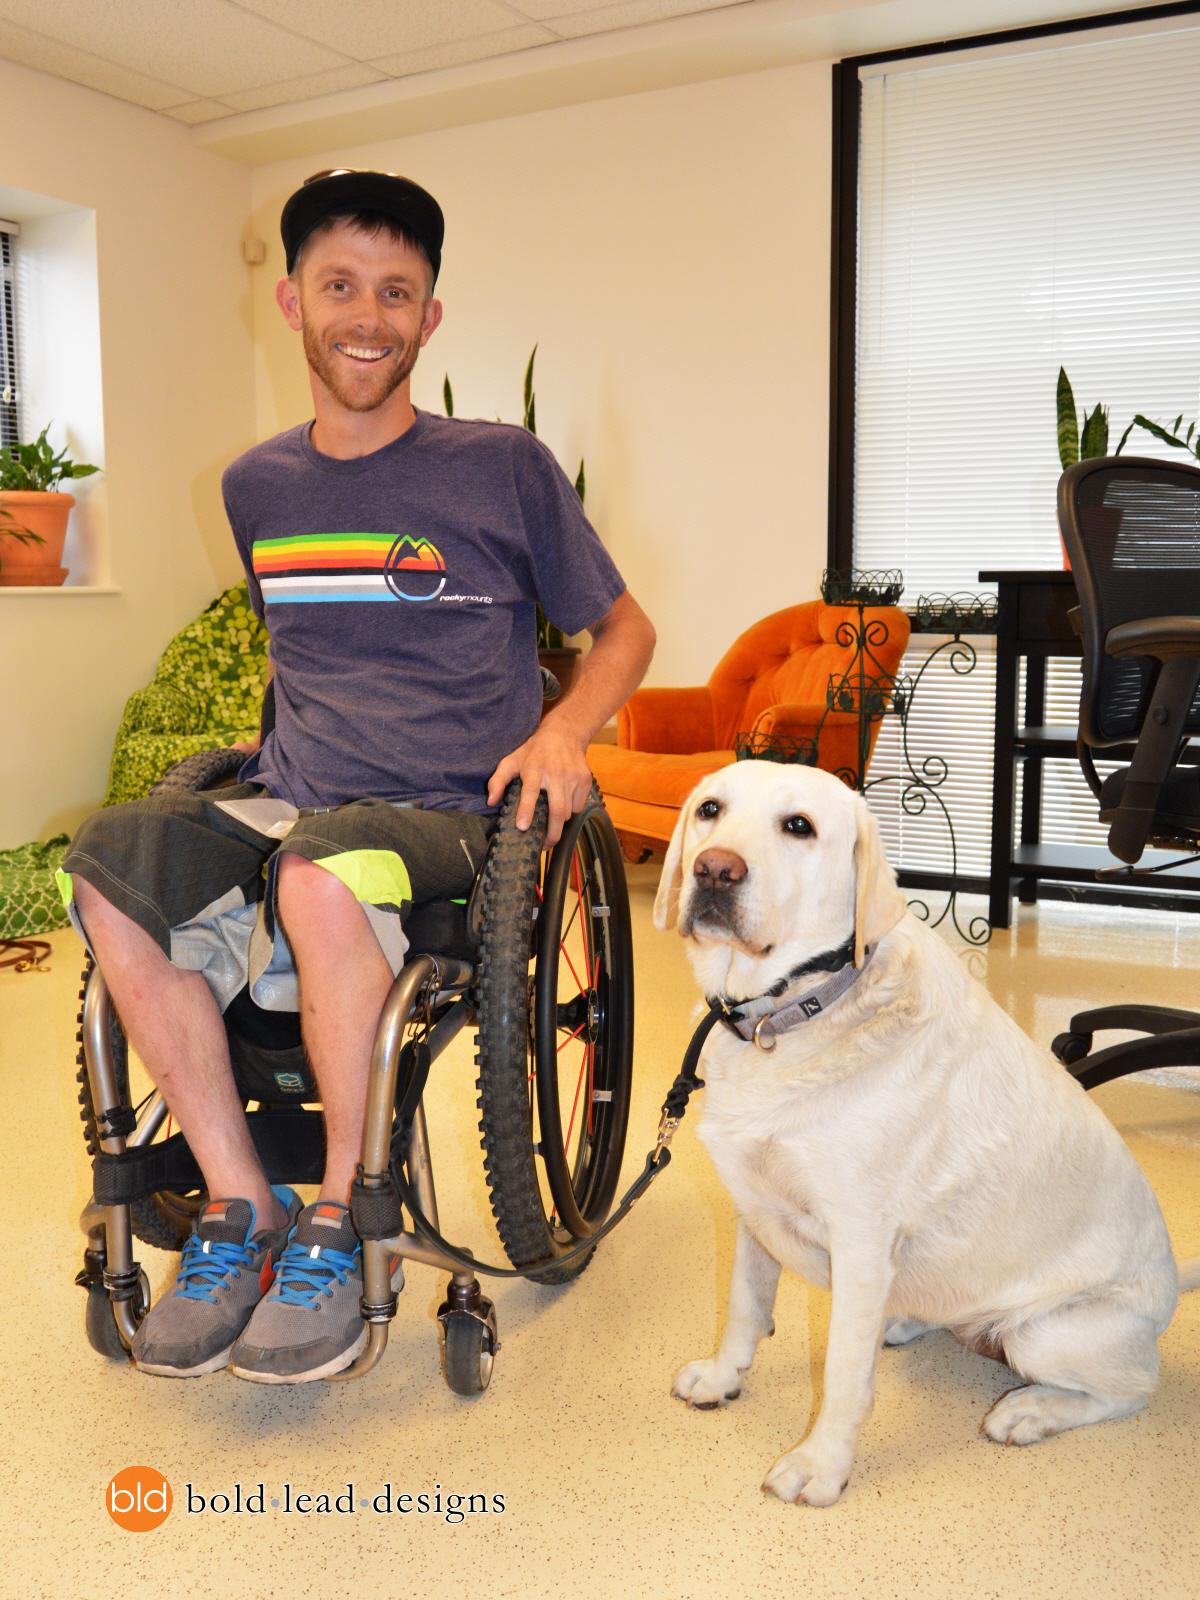 Adaptive dog leash